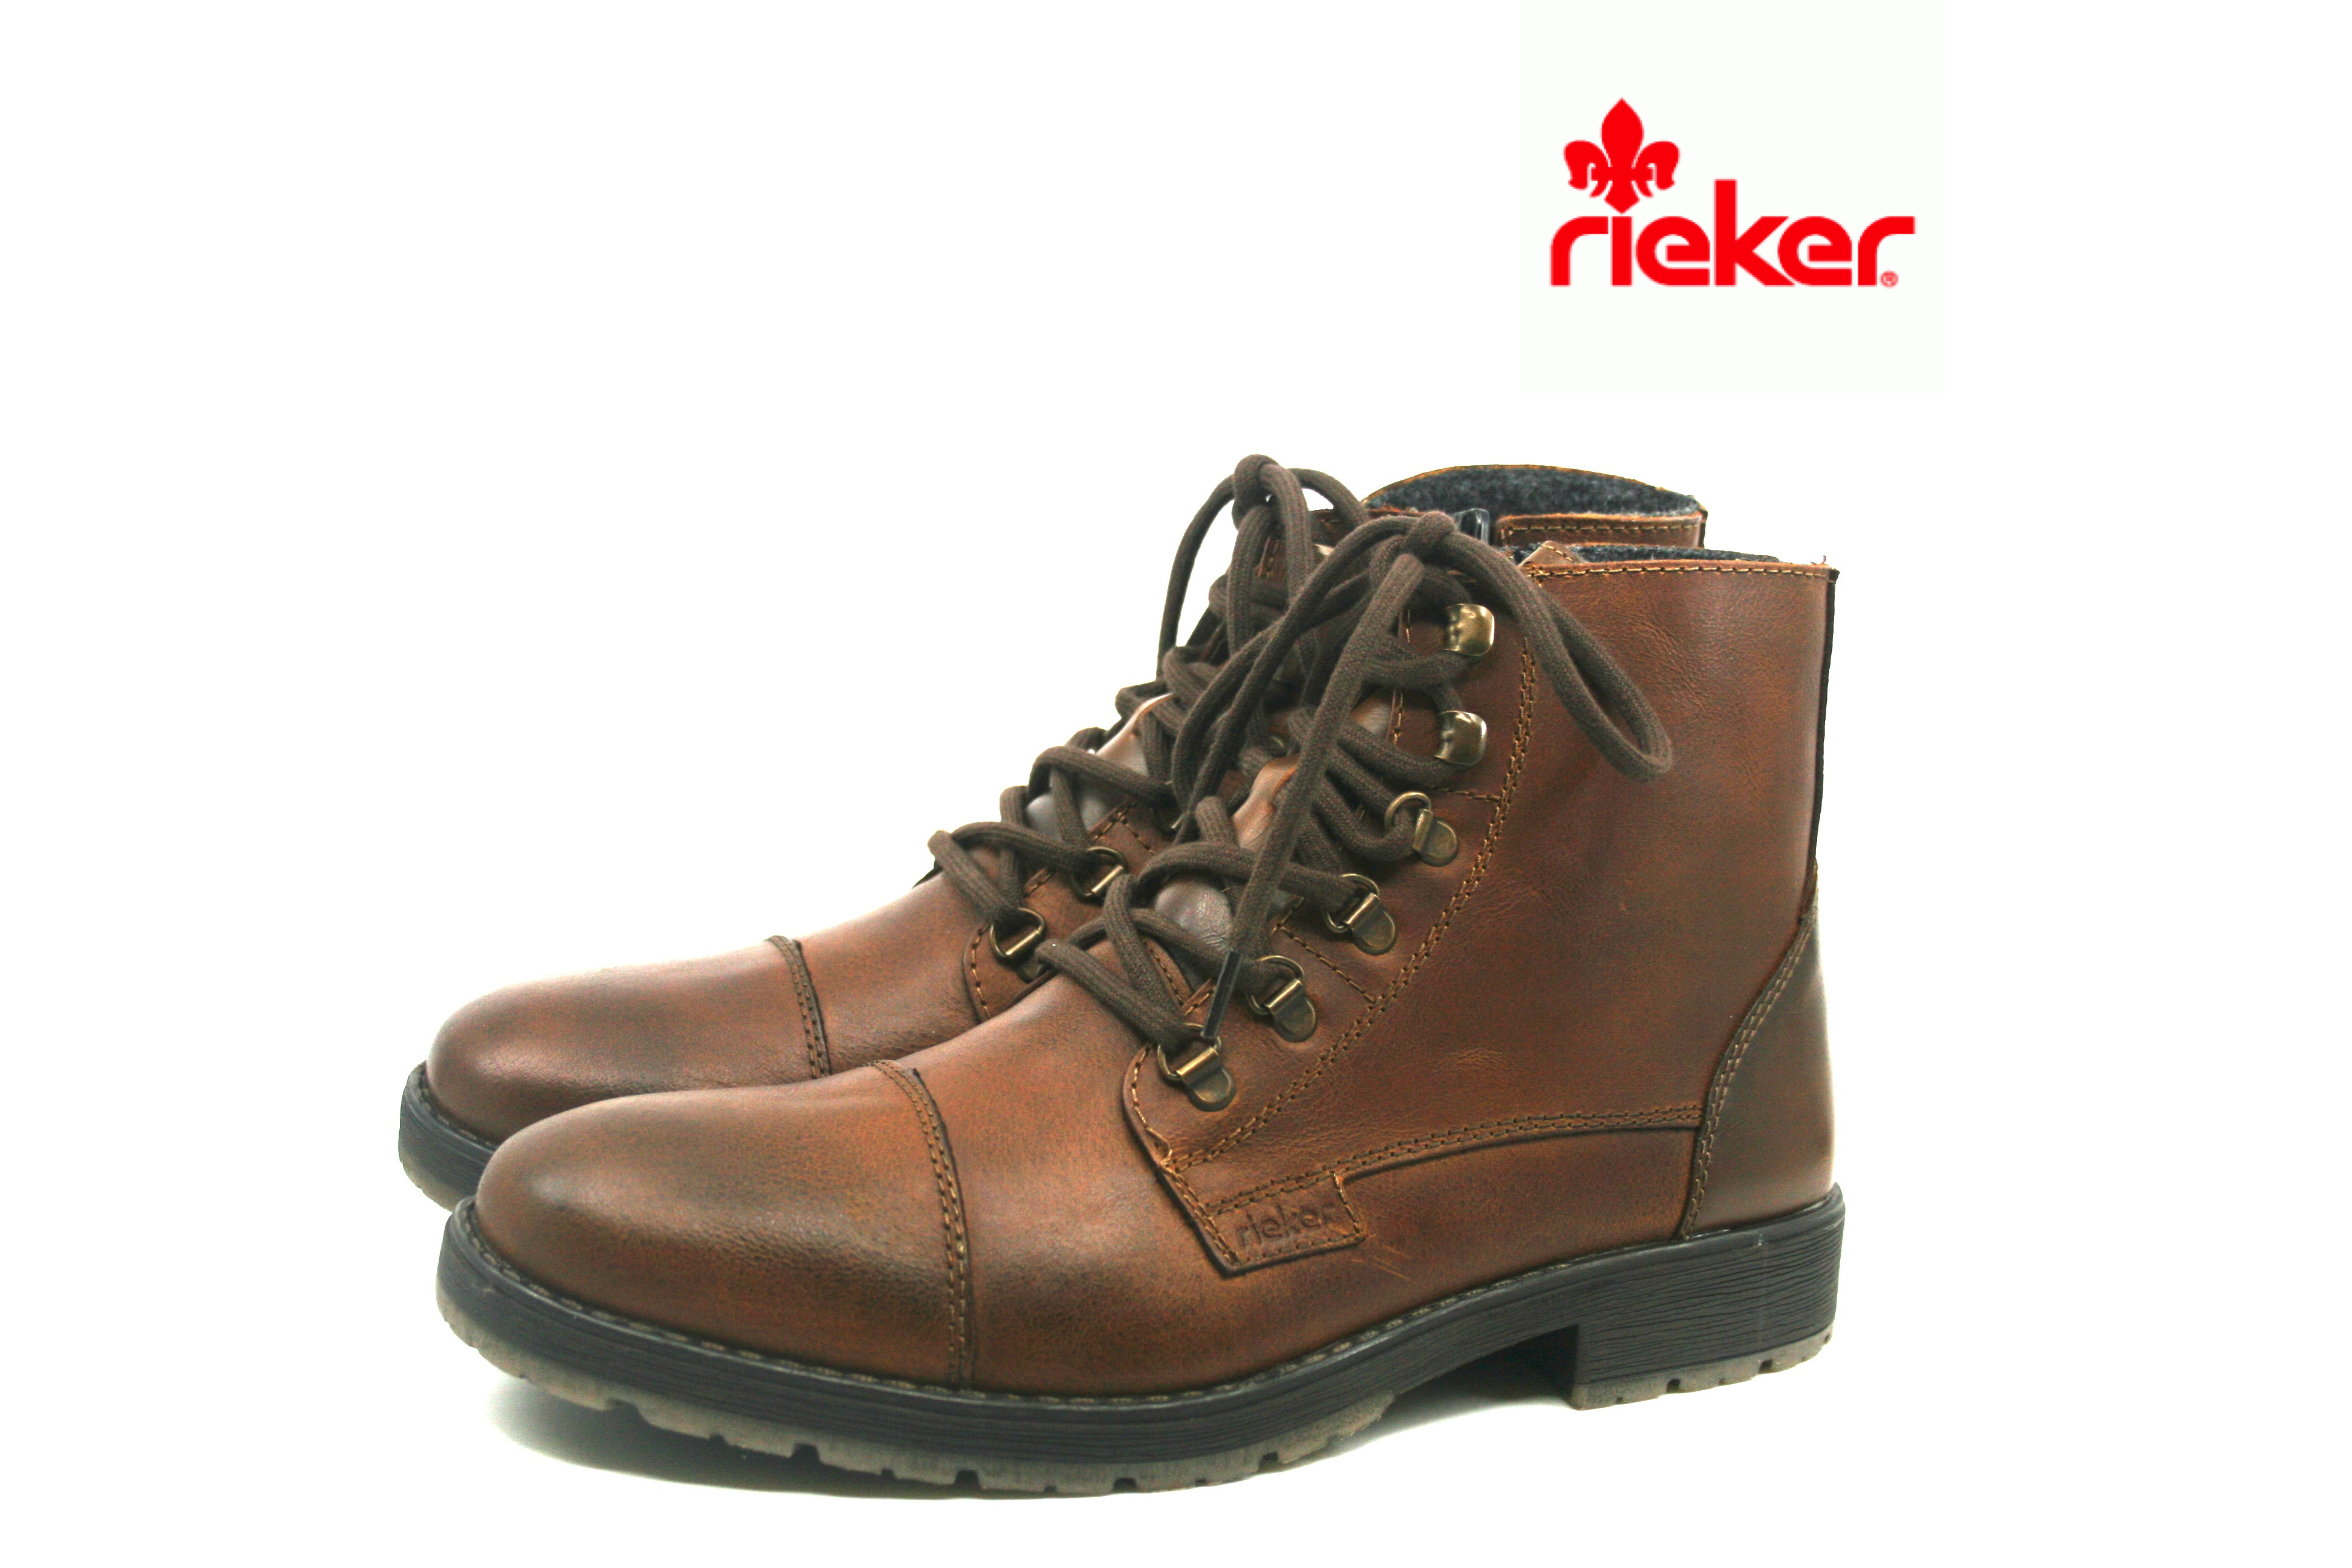 a48472225abf Damkjaer Sko Online Shop - Brun herre støvle med foer